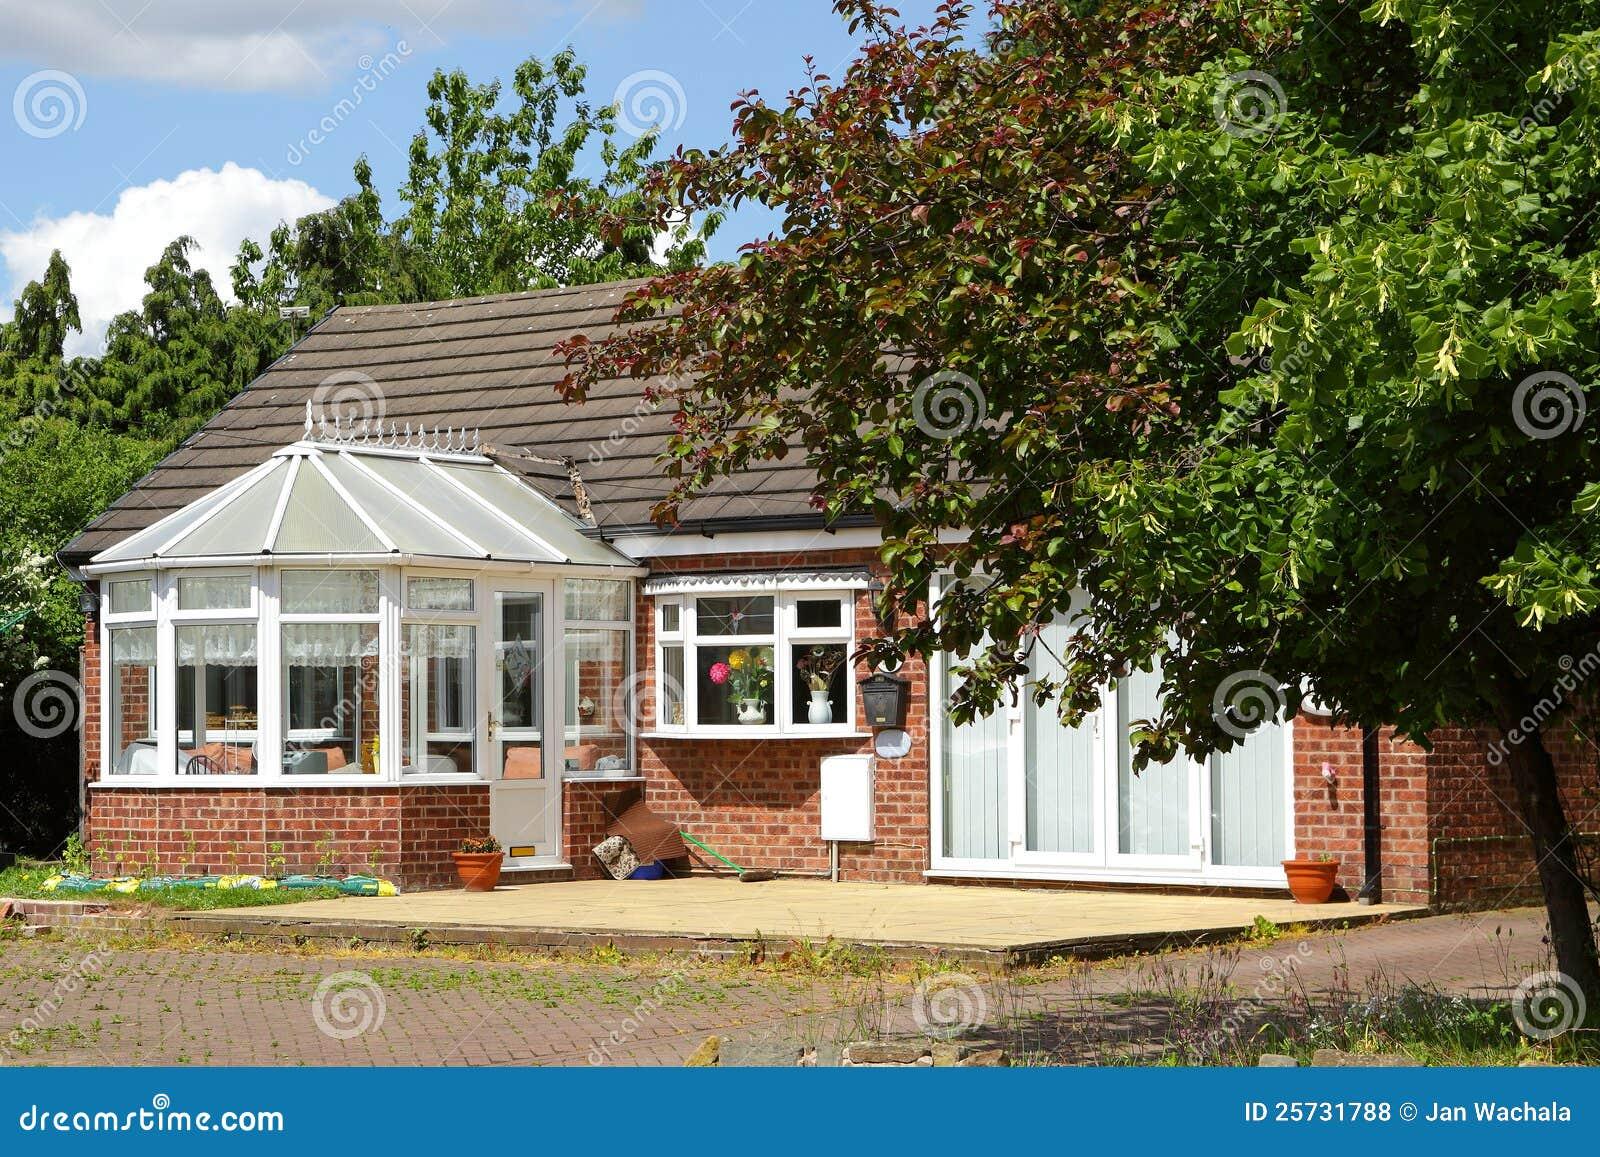 Typical english house royalty free stock photo - Maison jardin senior living community reims ...